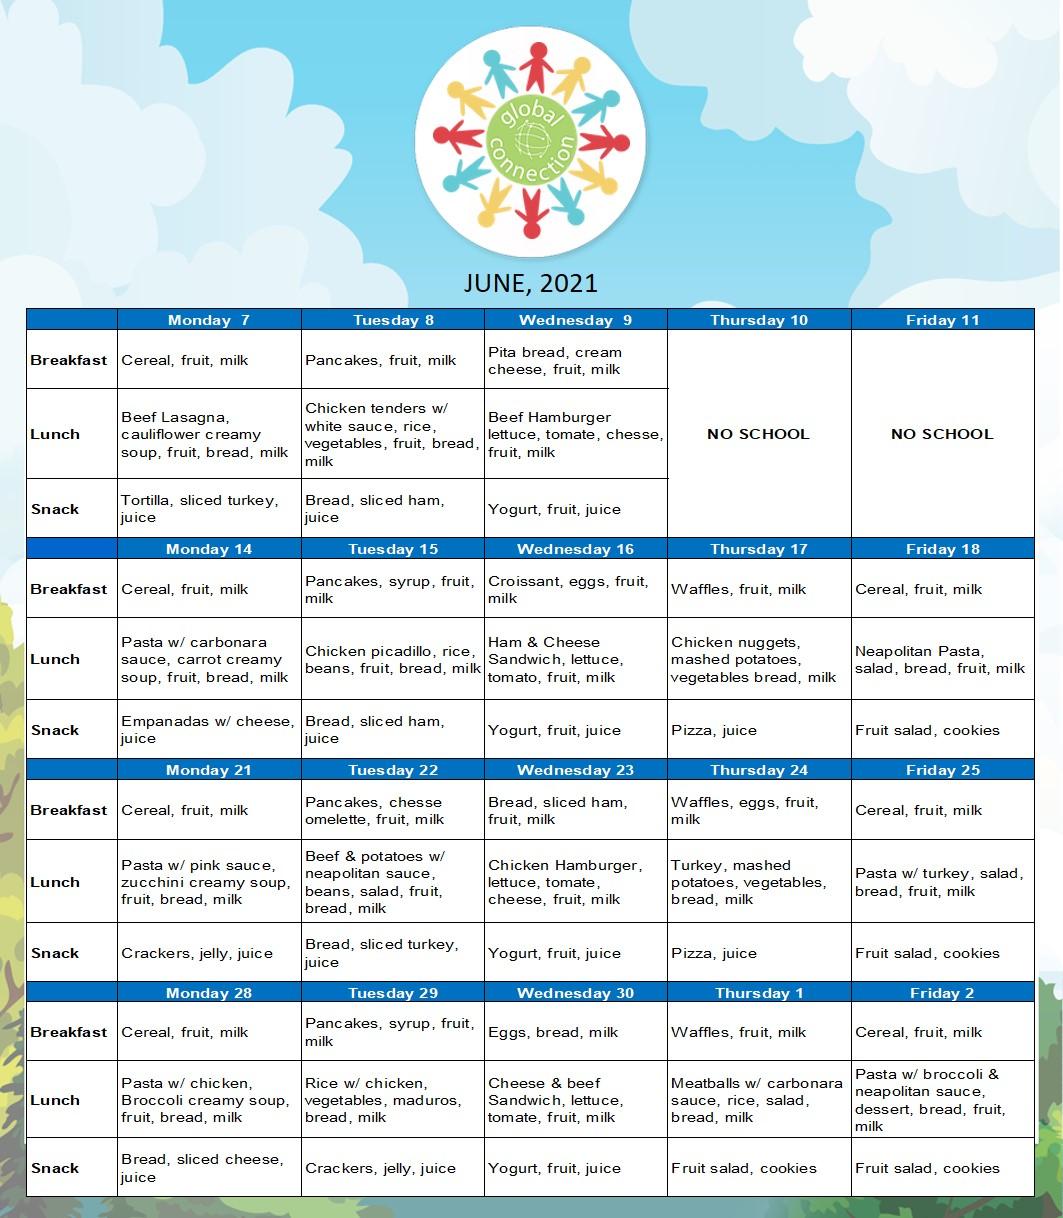 menu-june-2021-gcp.jpg